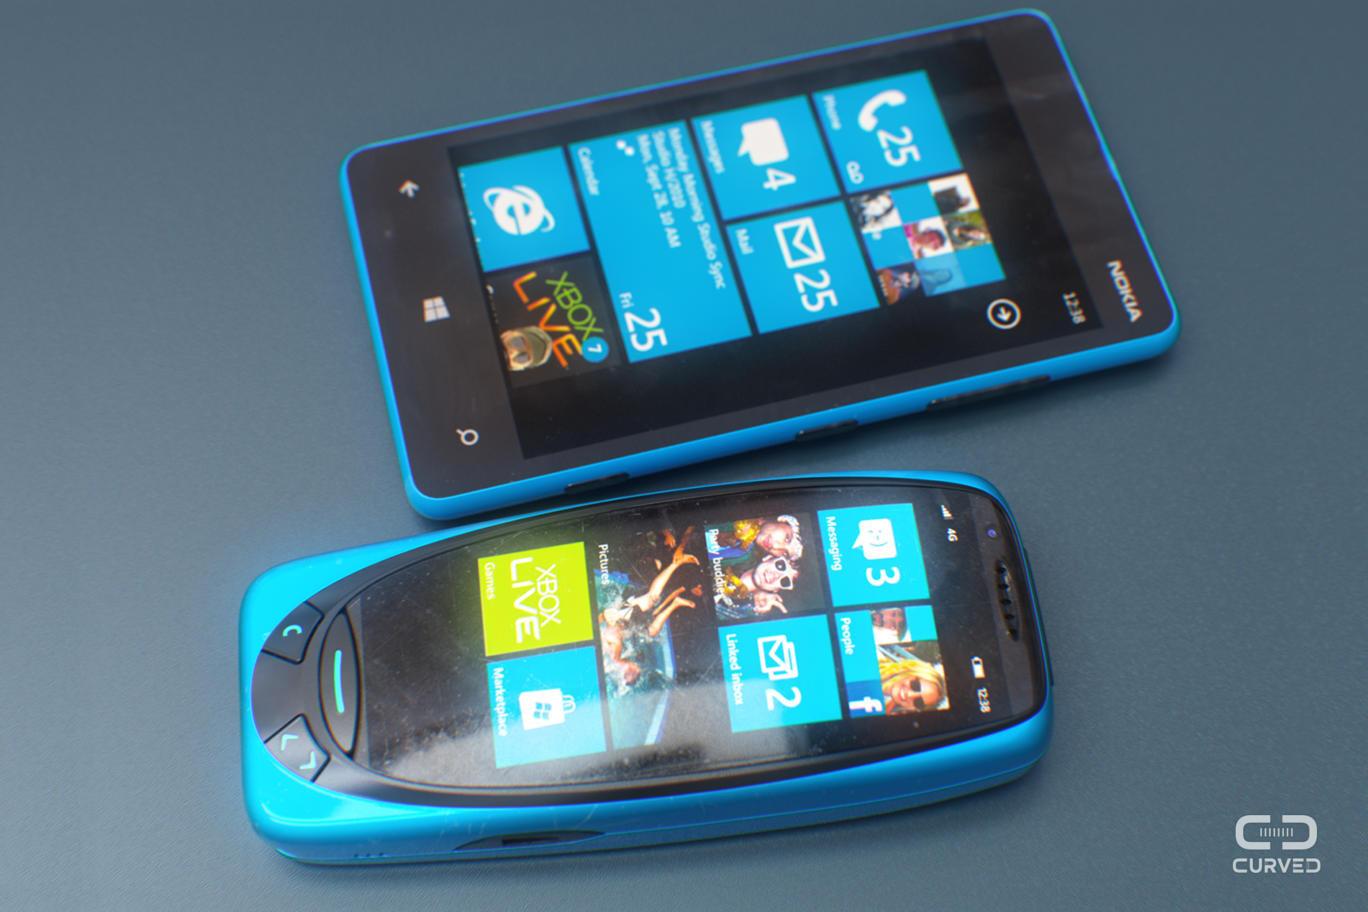 Nokia 3310 Touch Screen